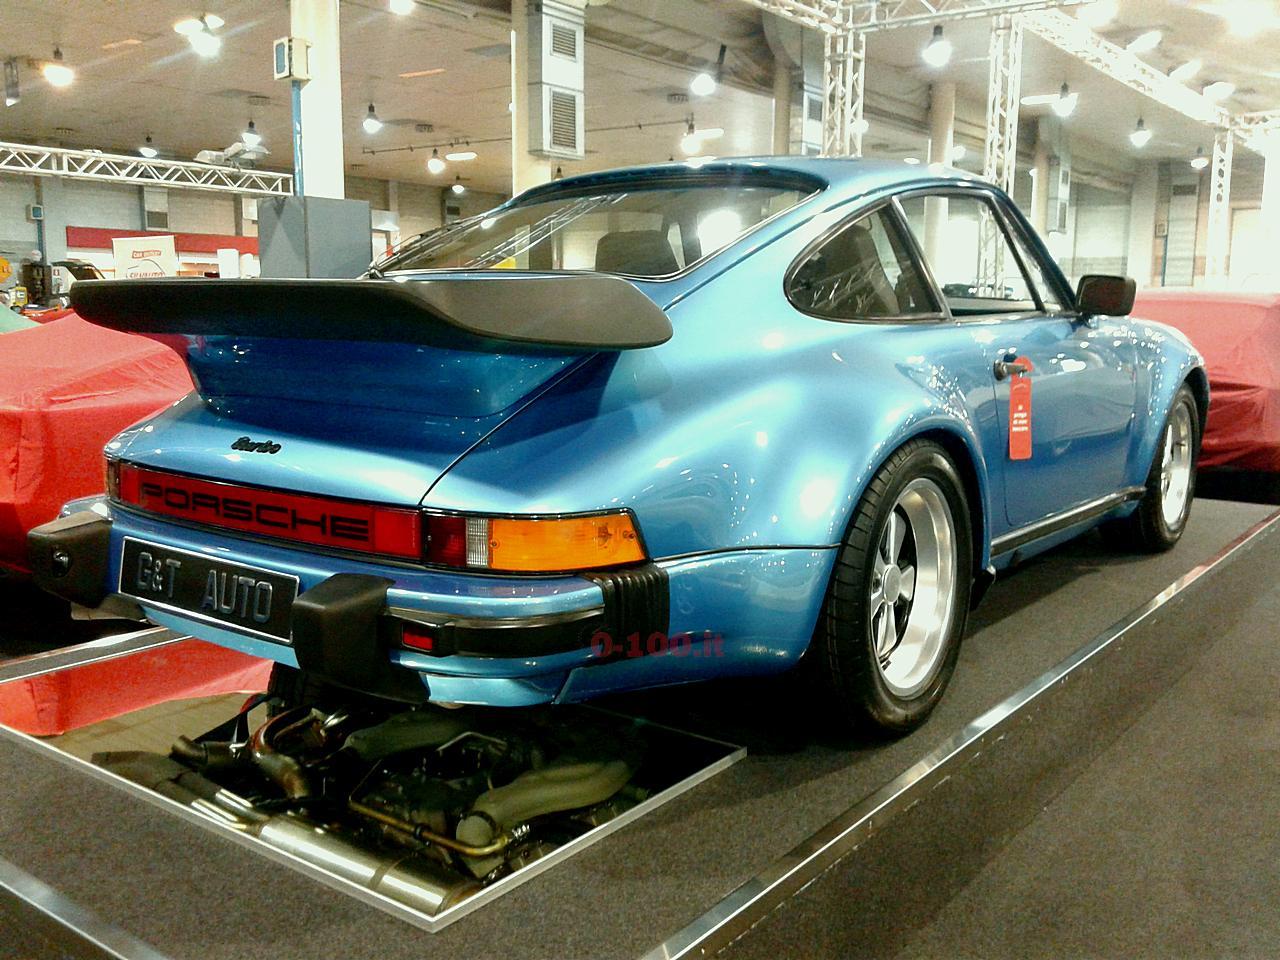 automotodepoca-2015-porsche-911-964-993-carrera-turbo_0-100_040